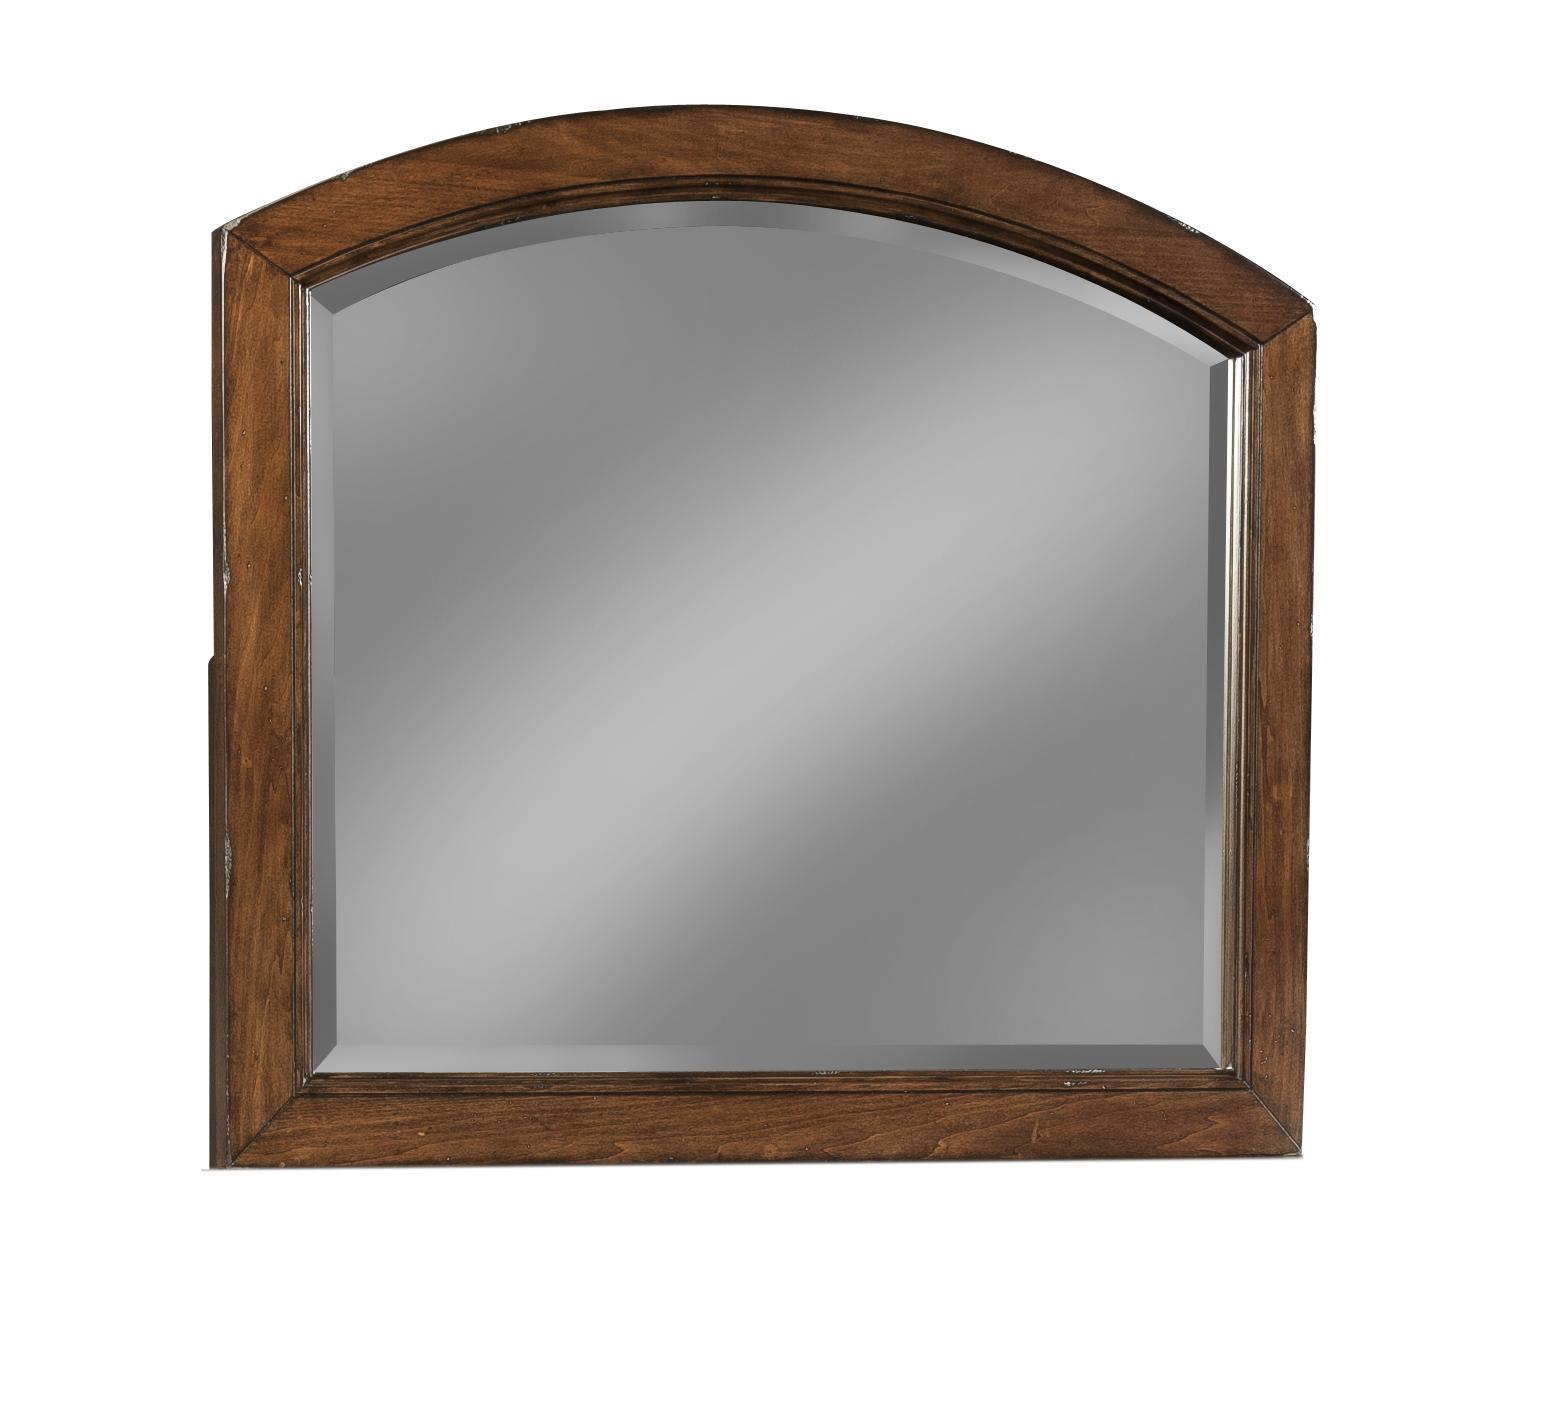 Carolina Preserves by Klaussner Blue Ridge Cherry Arched Mirror - Item Number: 426-660 MIRR